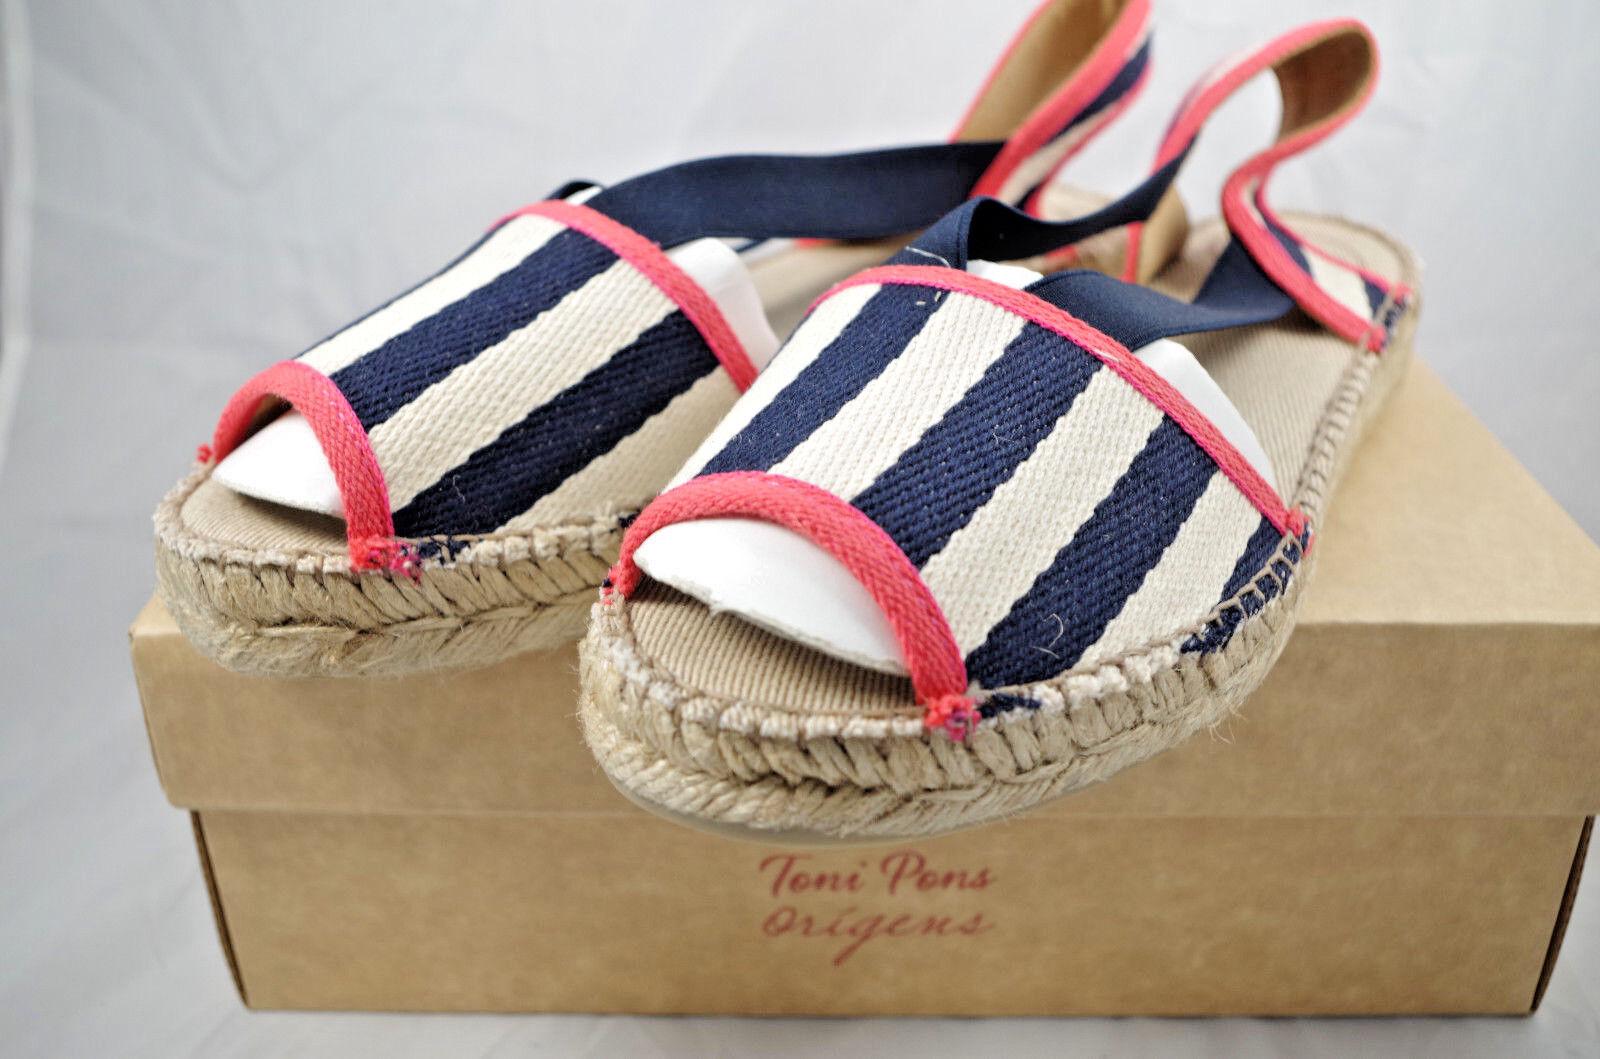 Toni Pons Estel-BE Navy Sandals Espadrilles Made in Spain Sz 38 EUR 7.5 US